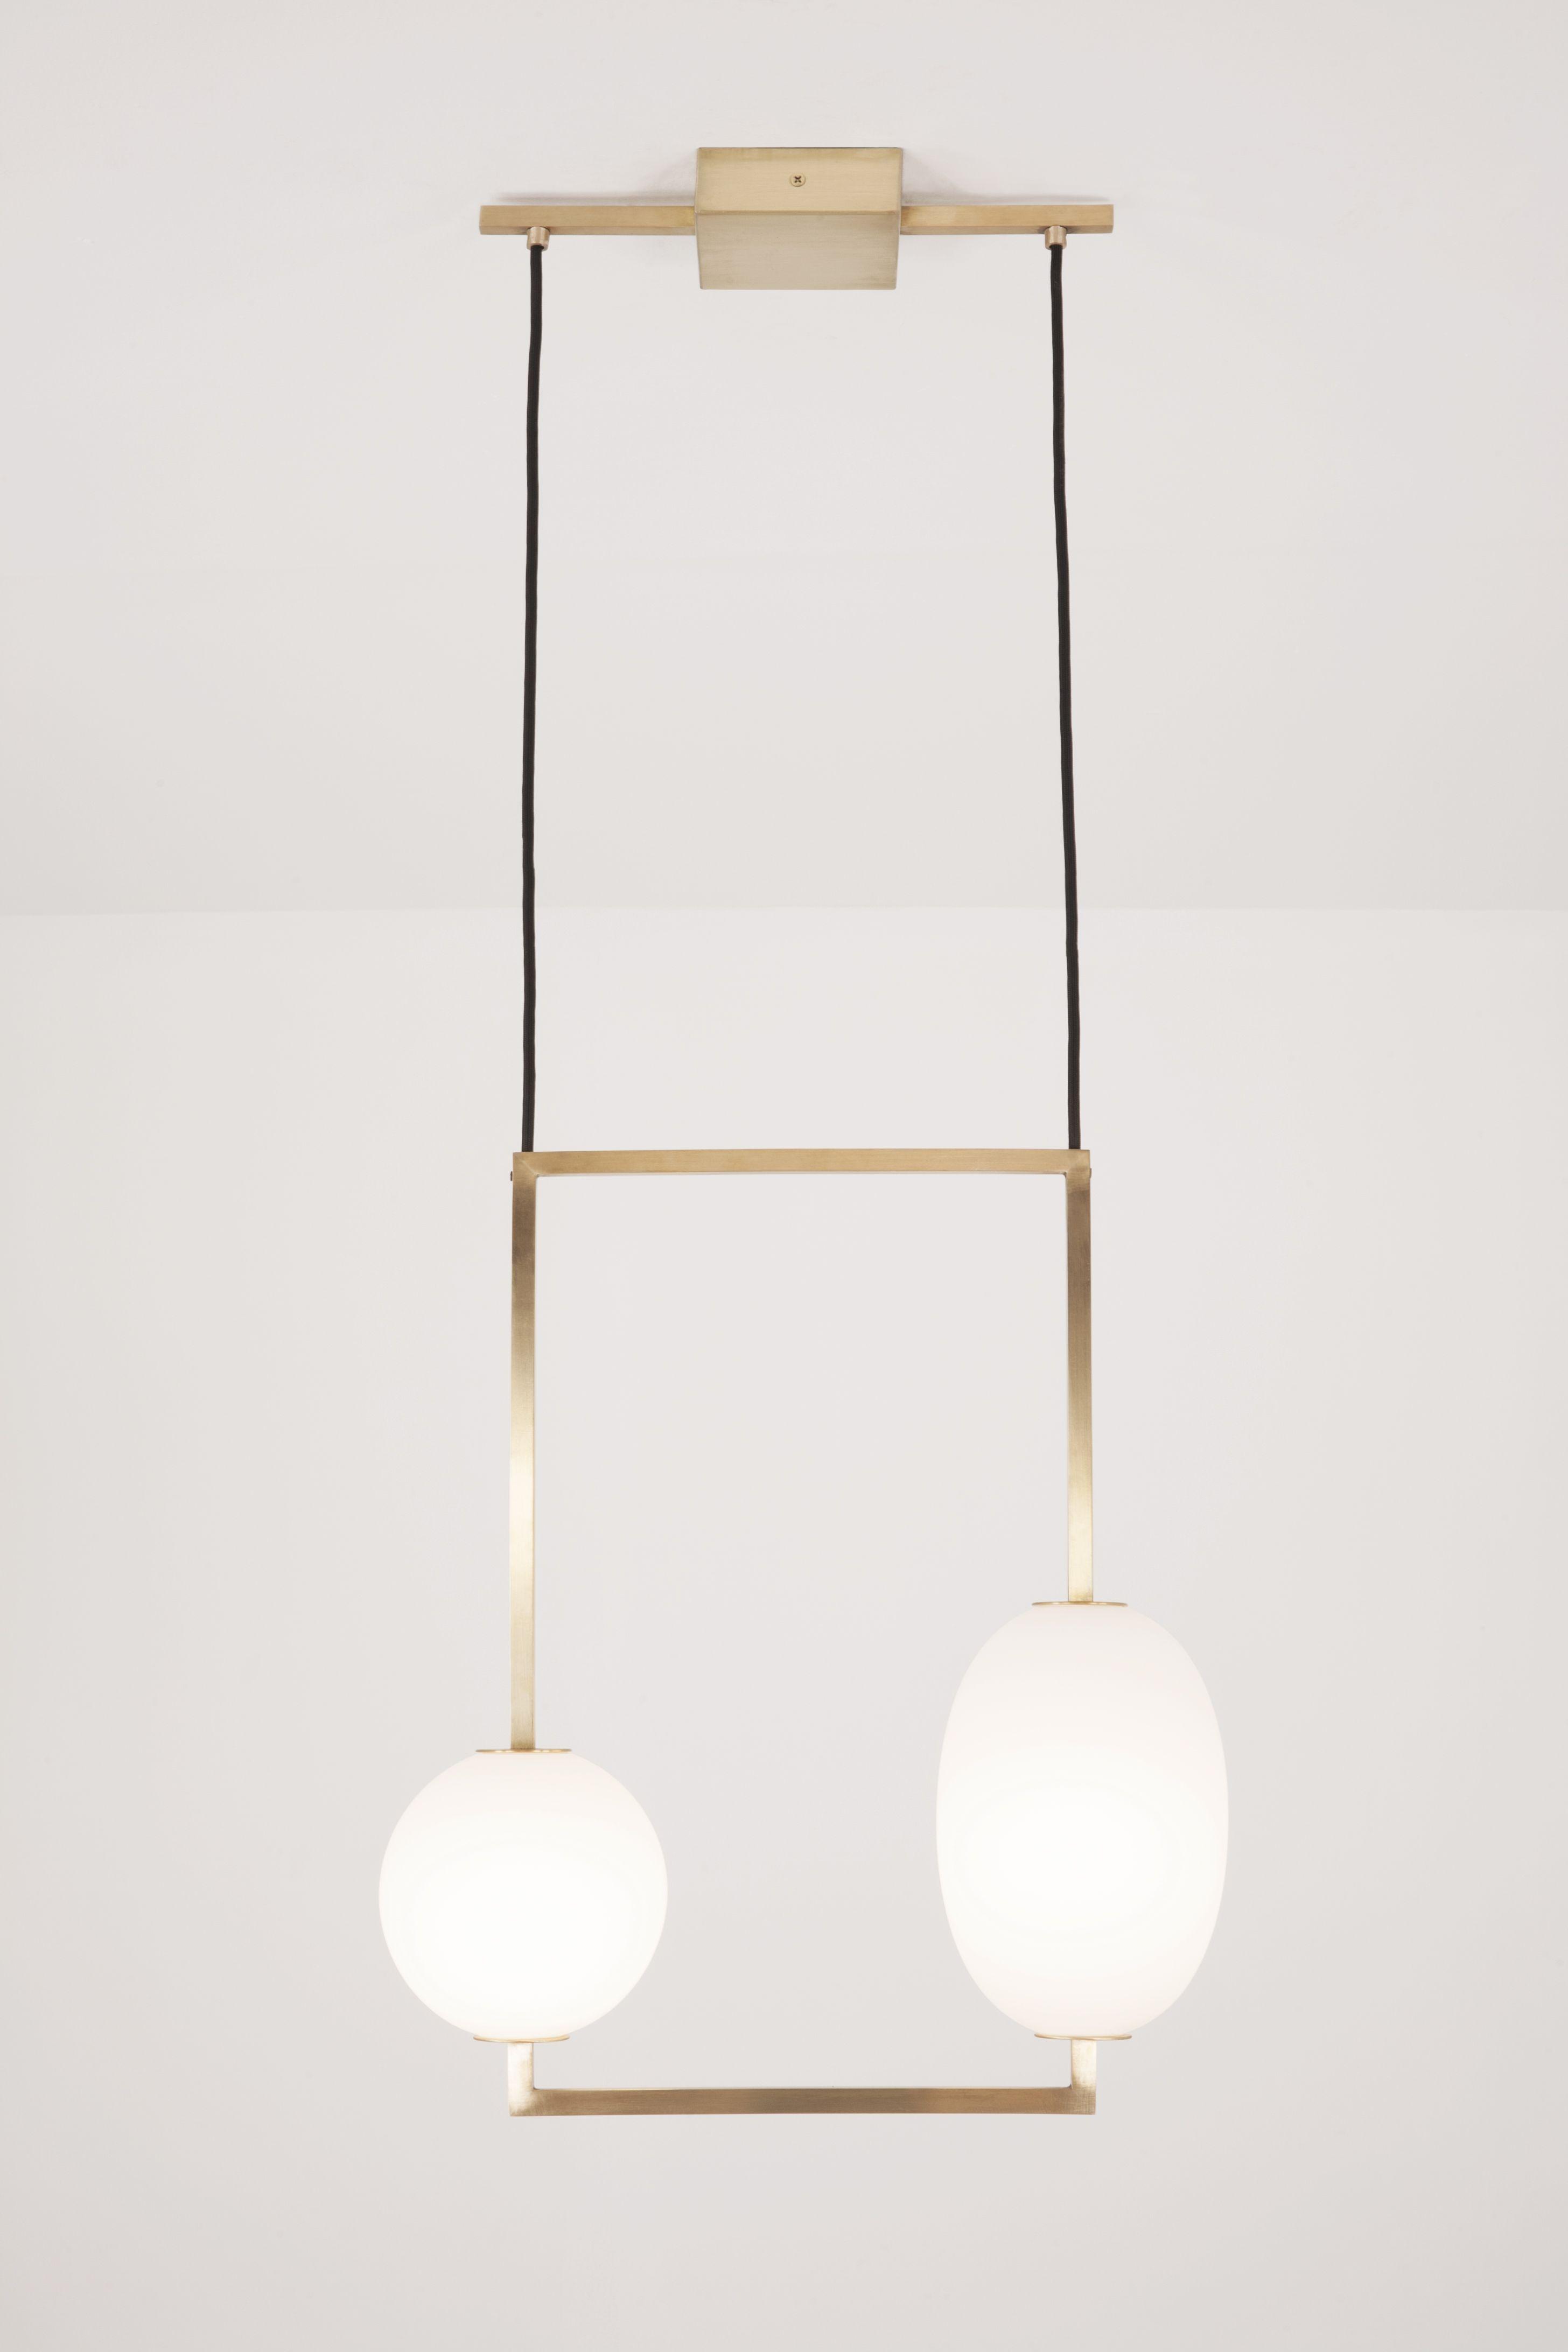 Miro 2 by Atelier de Troupe #verlichting #design | LIGHTING | Pinterest